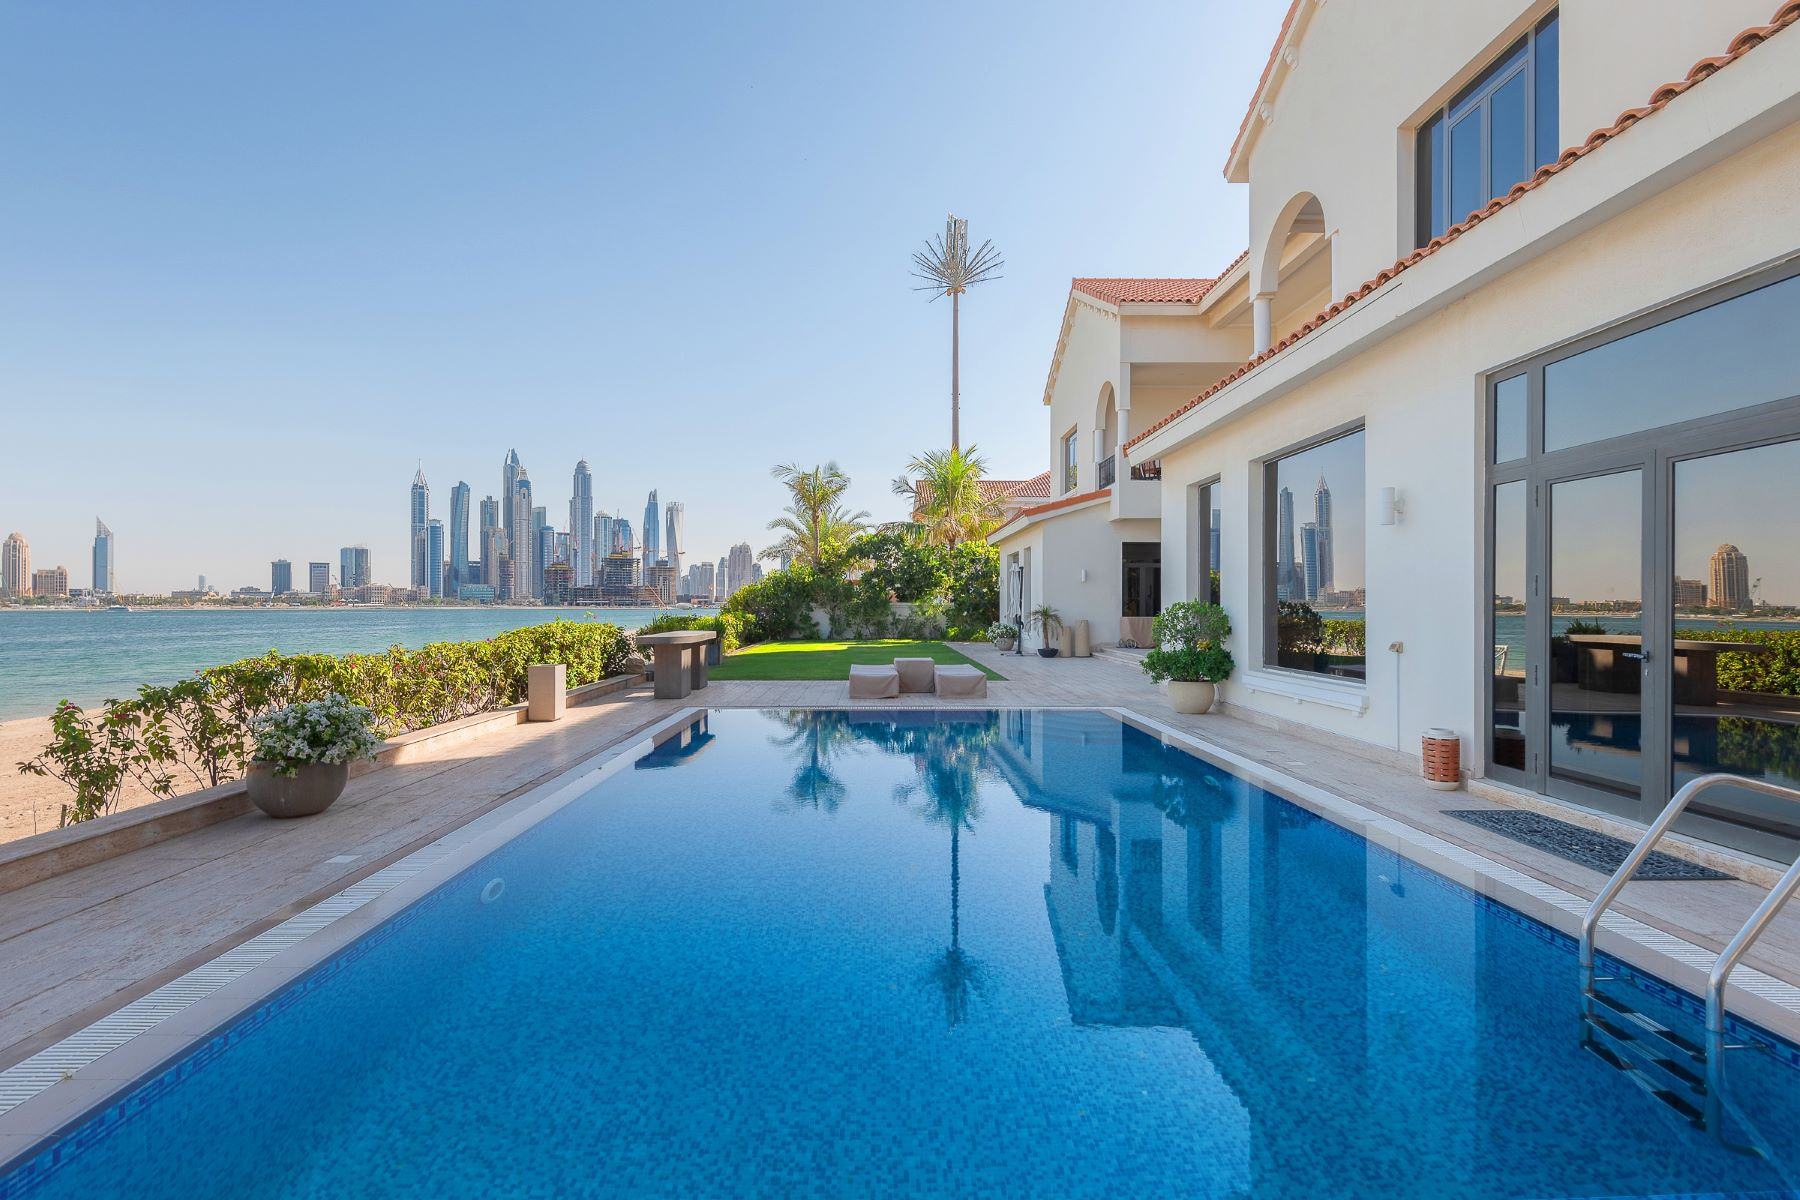 Property for Sale at Exclusive! Renovated Beachfront Signature Villa Dubai, Dubai United Arab Emirates